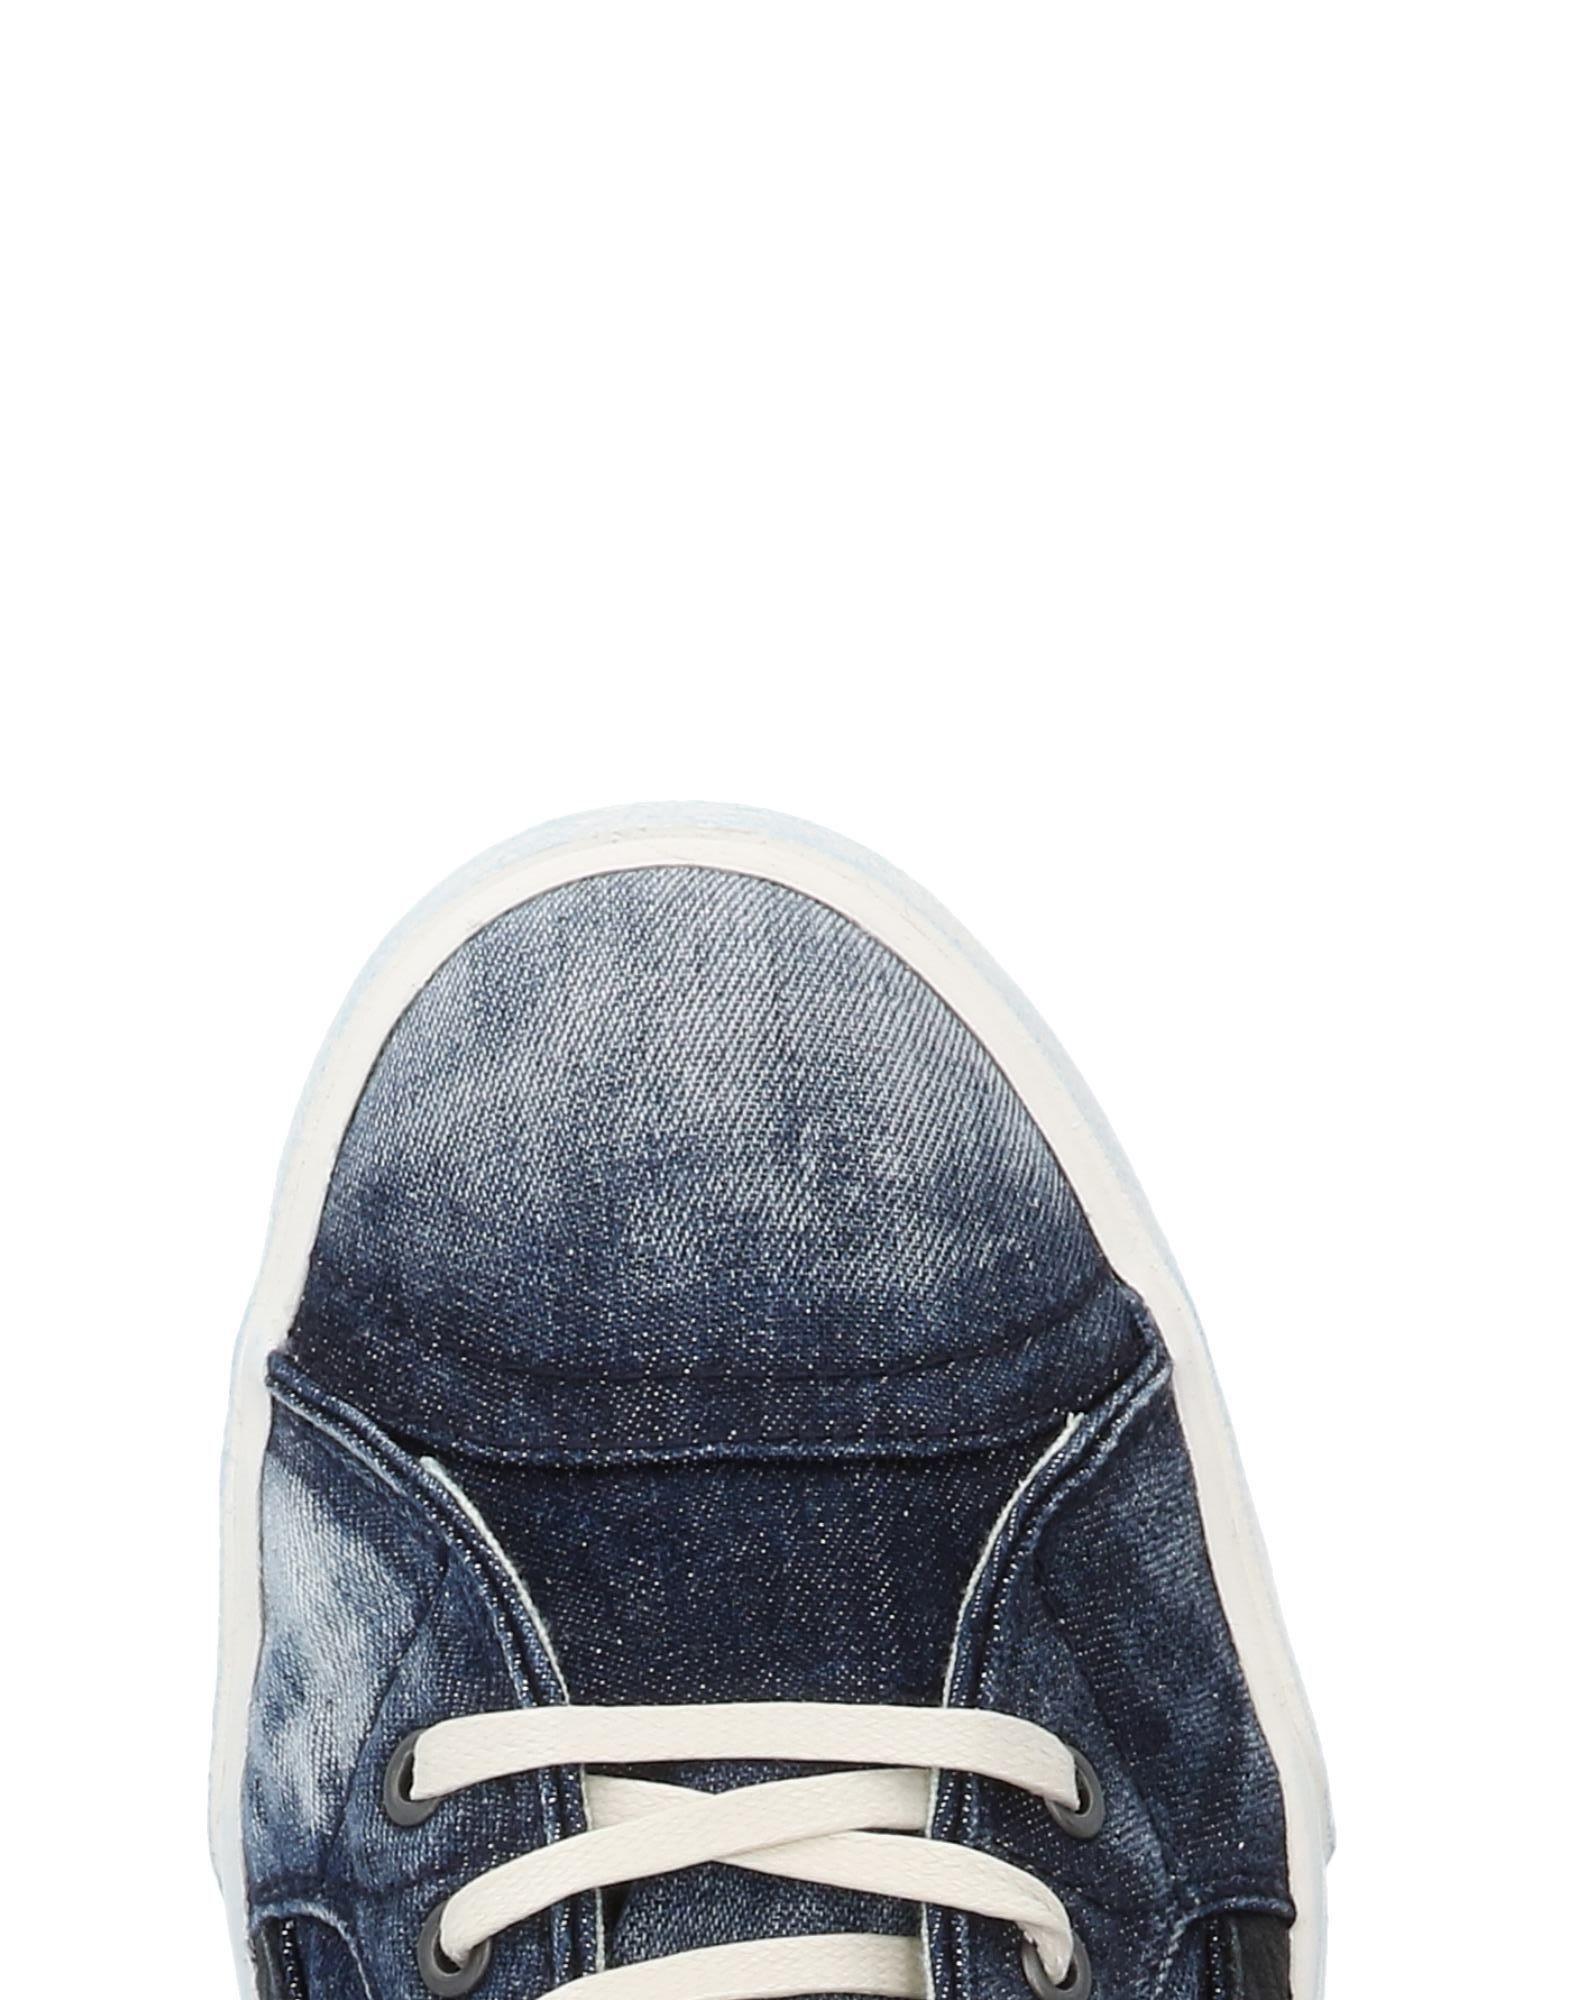 Moda Sneakers Sneakers Moda Diesel Uomo - 11491148QG 287610